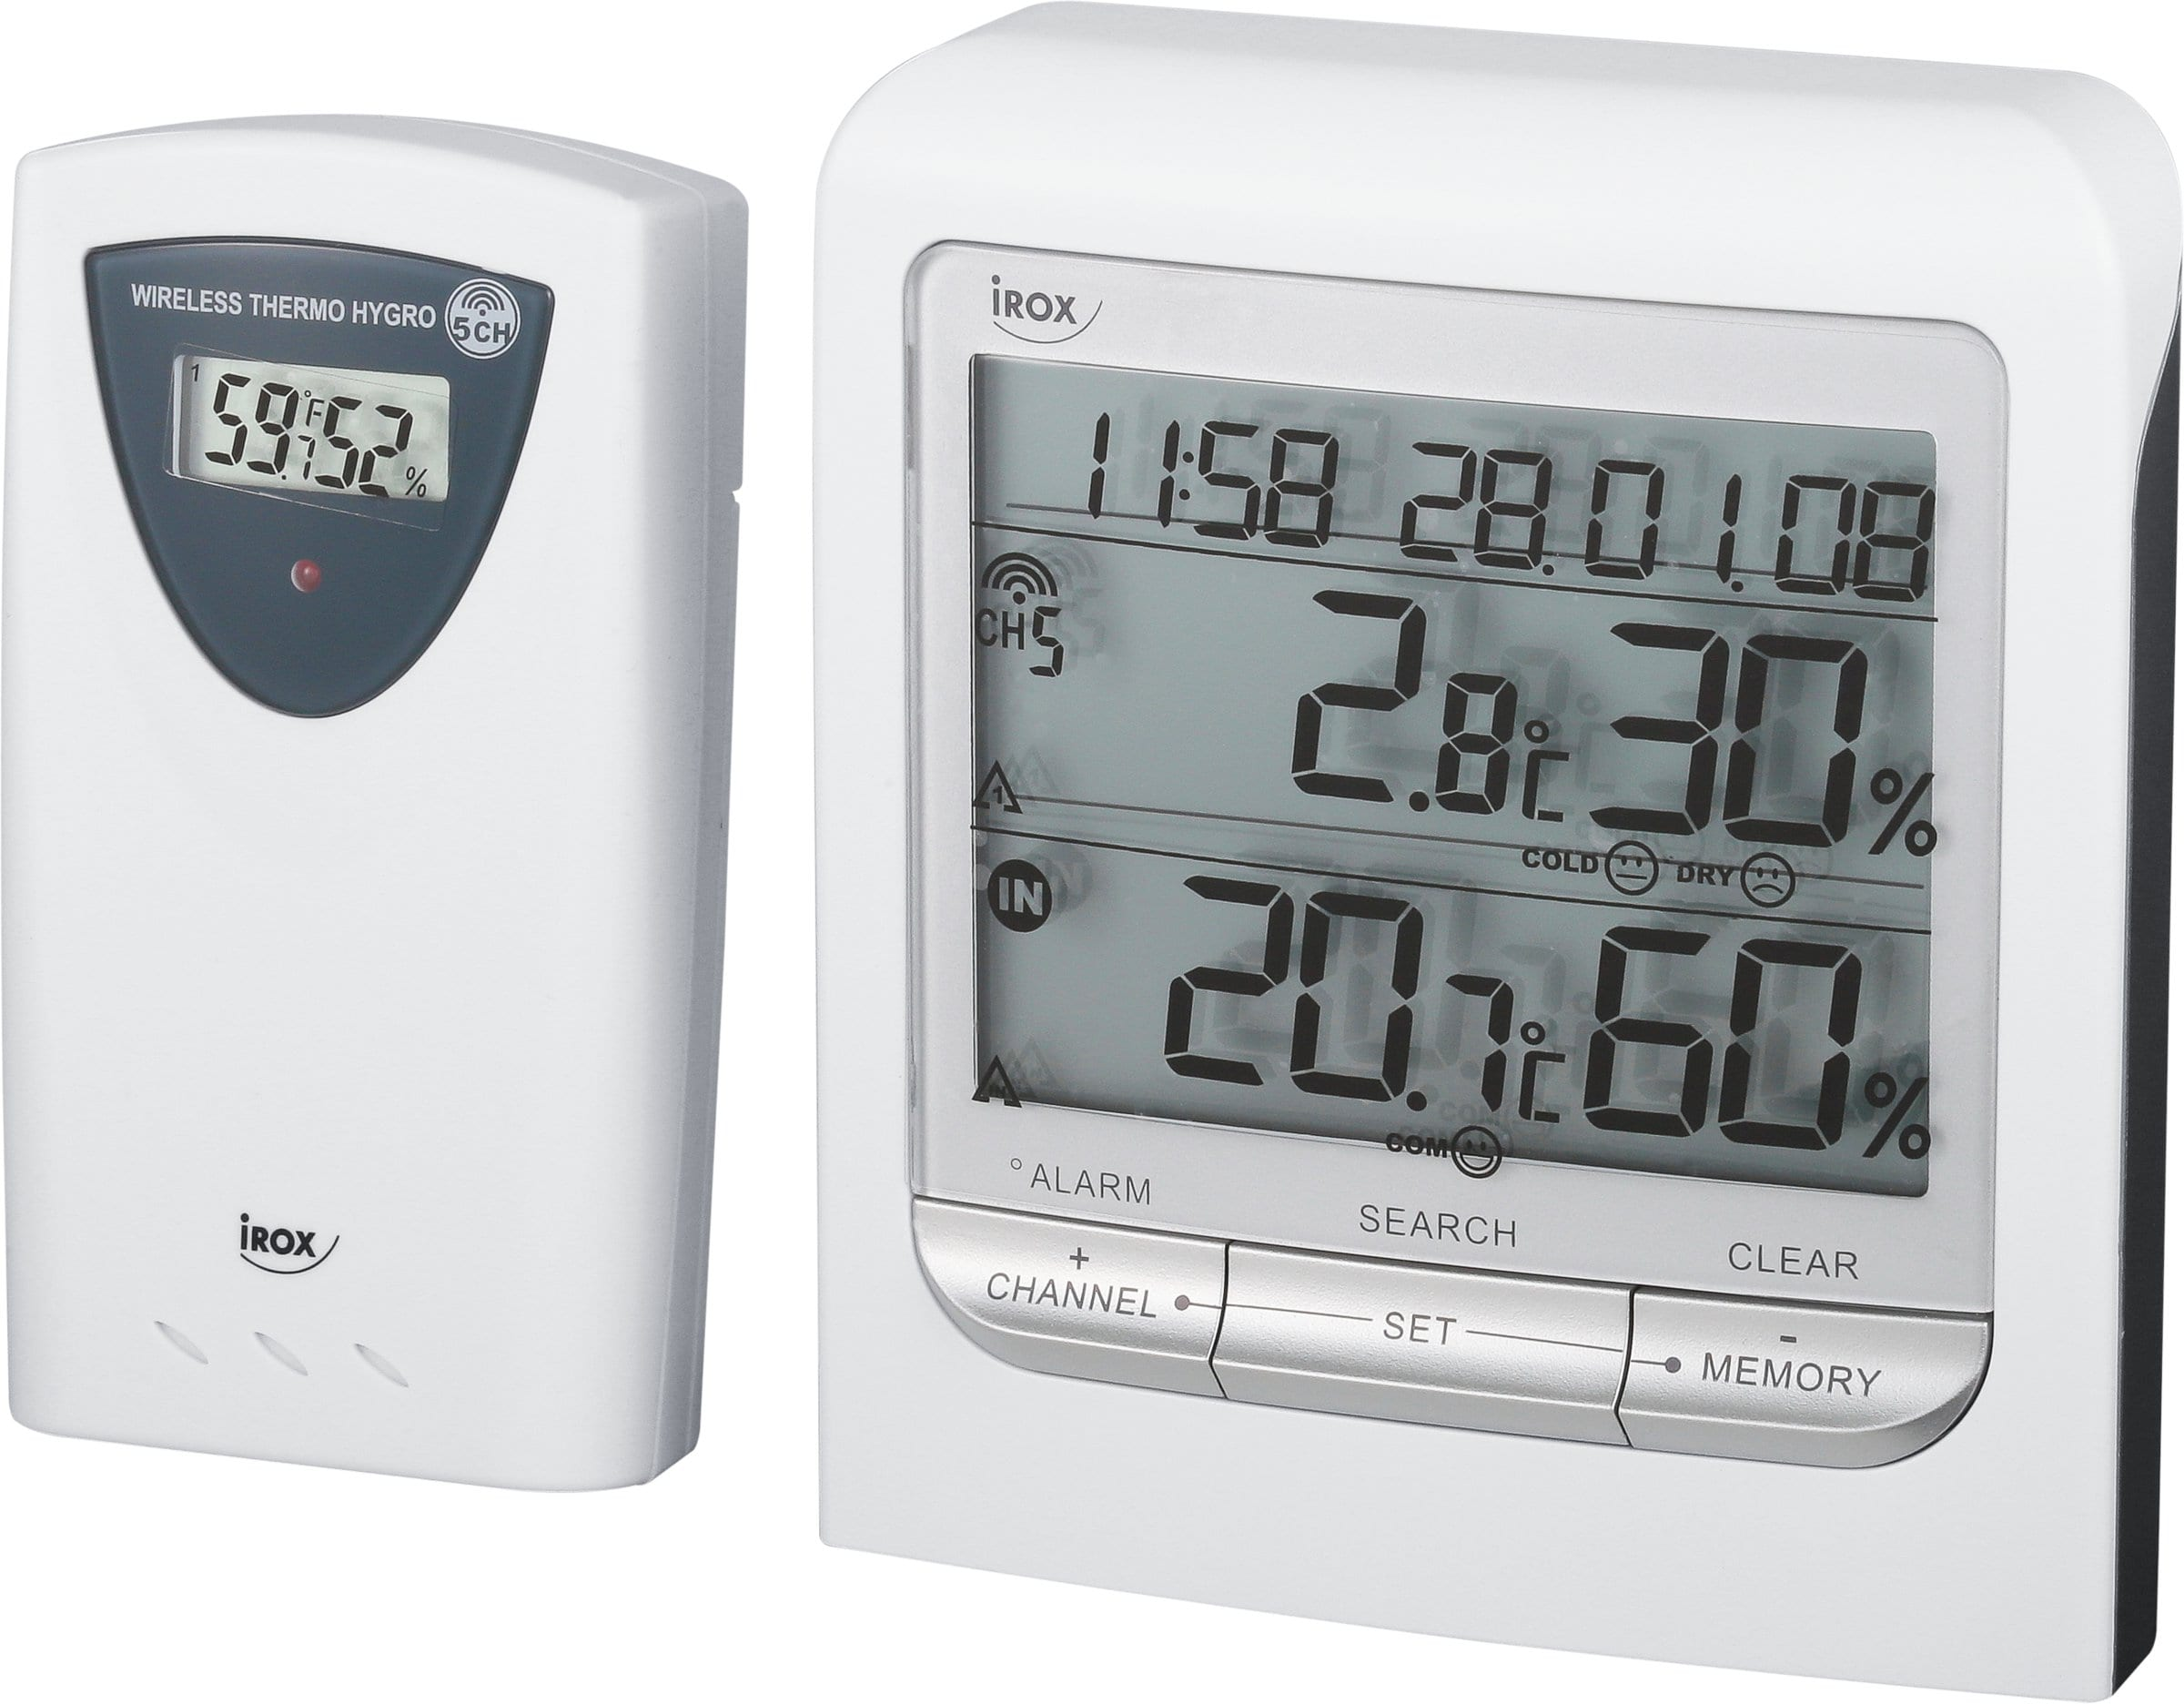 Irox Thermo/hygromètre sans fil HTG79